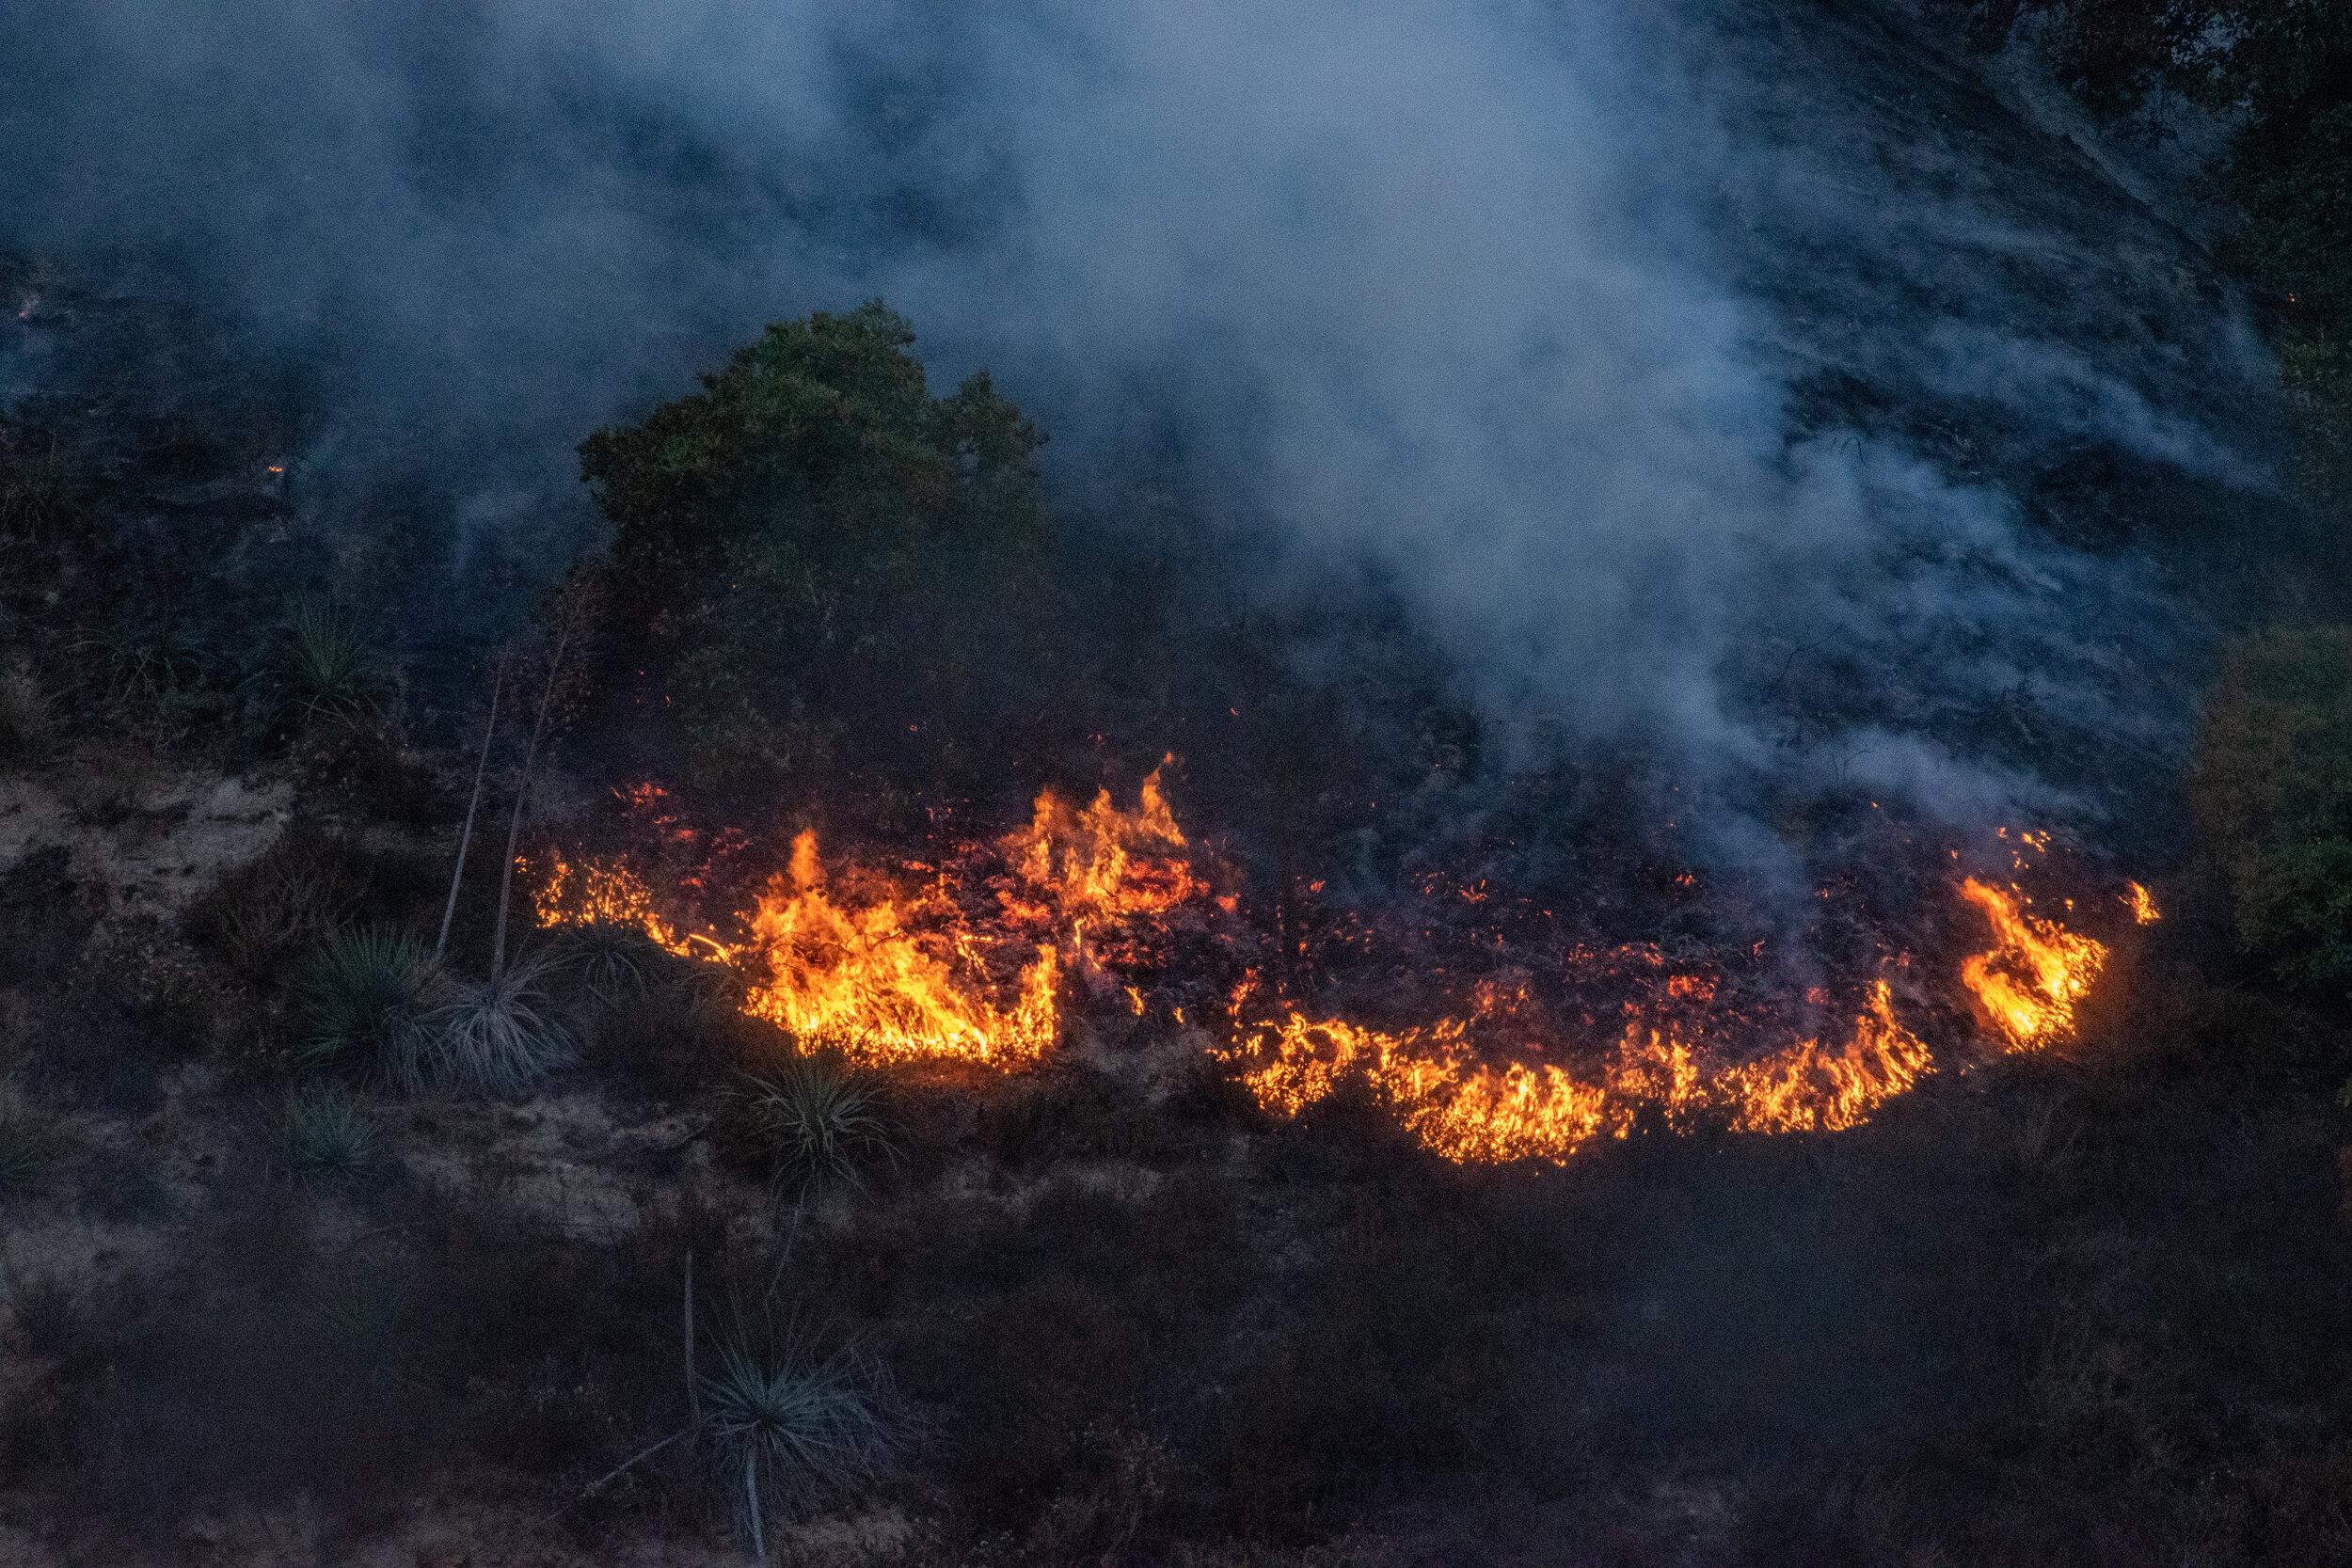 A hillside fire blazes beside the South I-5 freeway just north of Sylmar, Calif. on Friday, Oct. 11, 2019 as the Saddleridge Fire burns through the San Fernando Valley. (Randy Martinez/The Corsair)